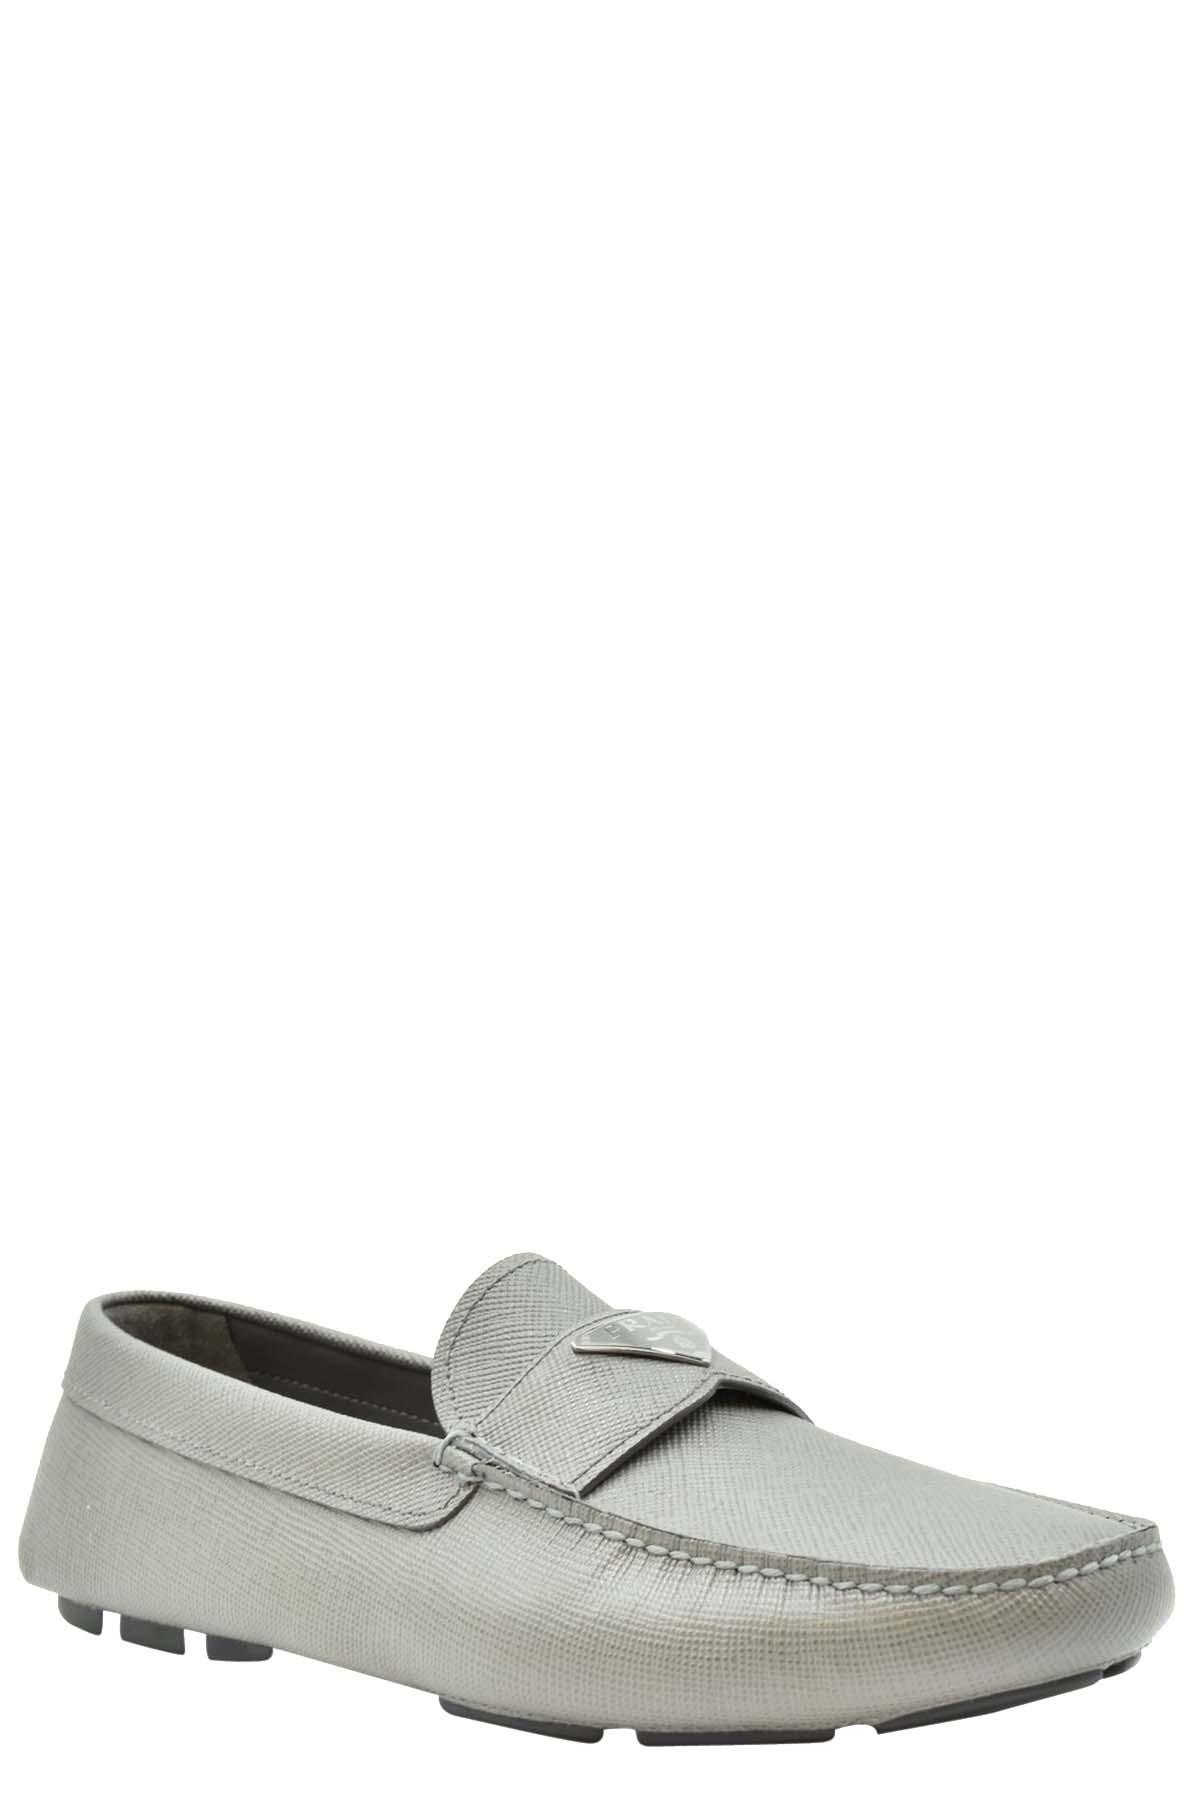 Prada Grey Saffiano Leather Loafers Size UK 11 (EU 45)  - buy with discount